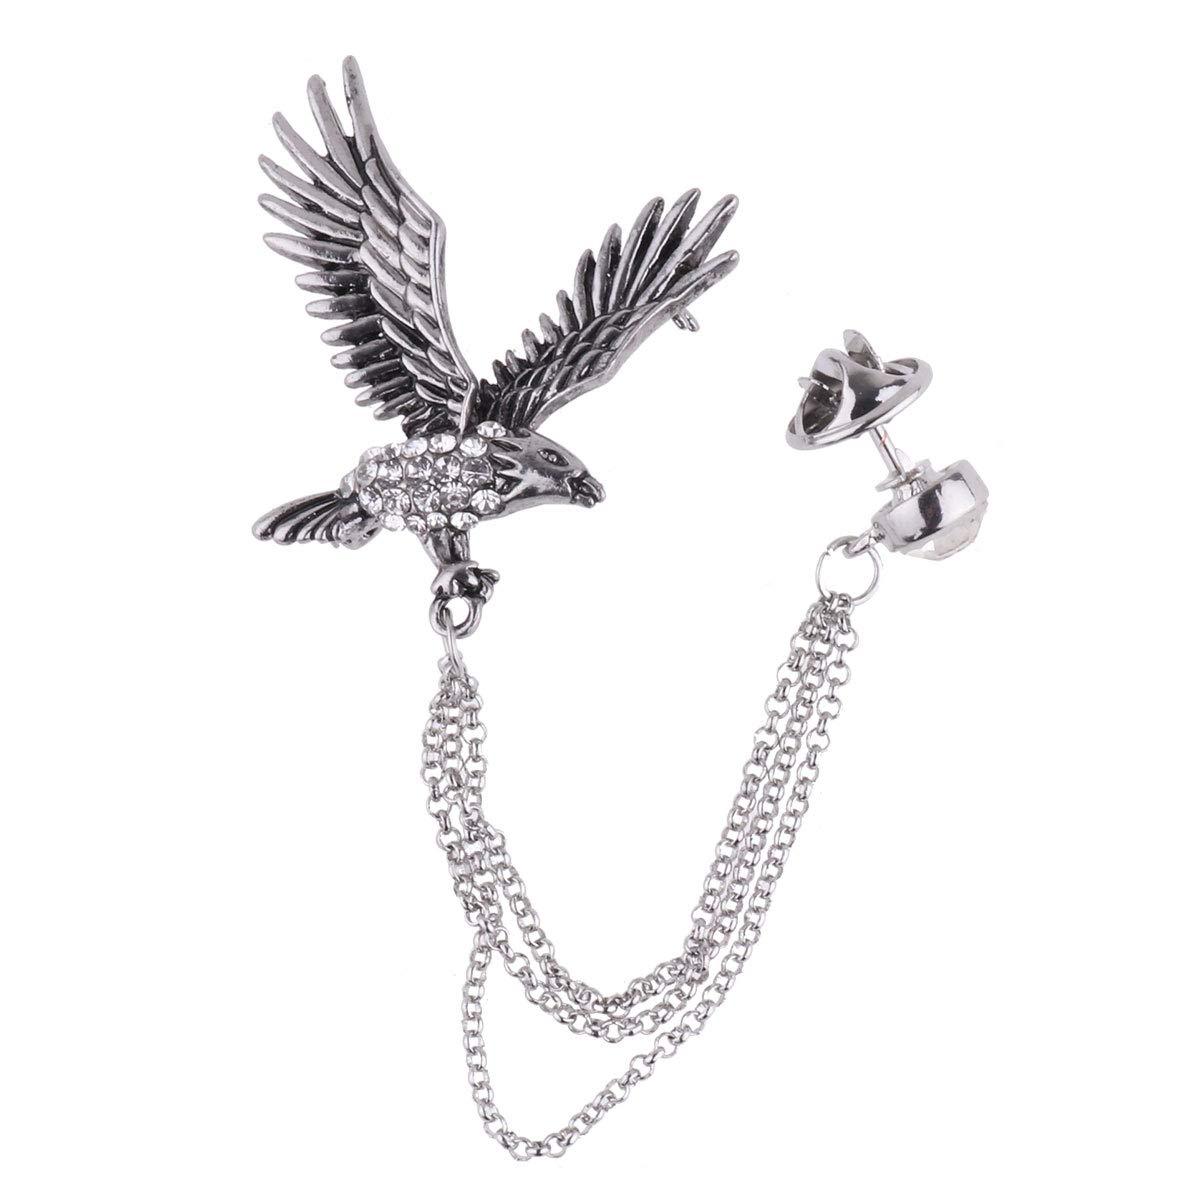 amazon tiaobug men s elegant eagle crystal chain lapel pin Star Trek Klingon Bird of Prey amazon tiaobug men s elegant eagle crystal chain lapel pin brooch for suit tuxedo clothing